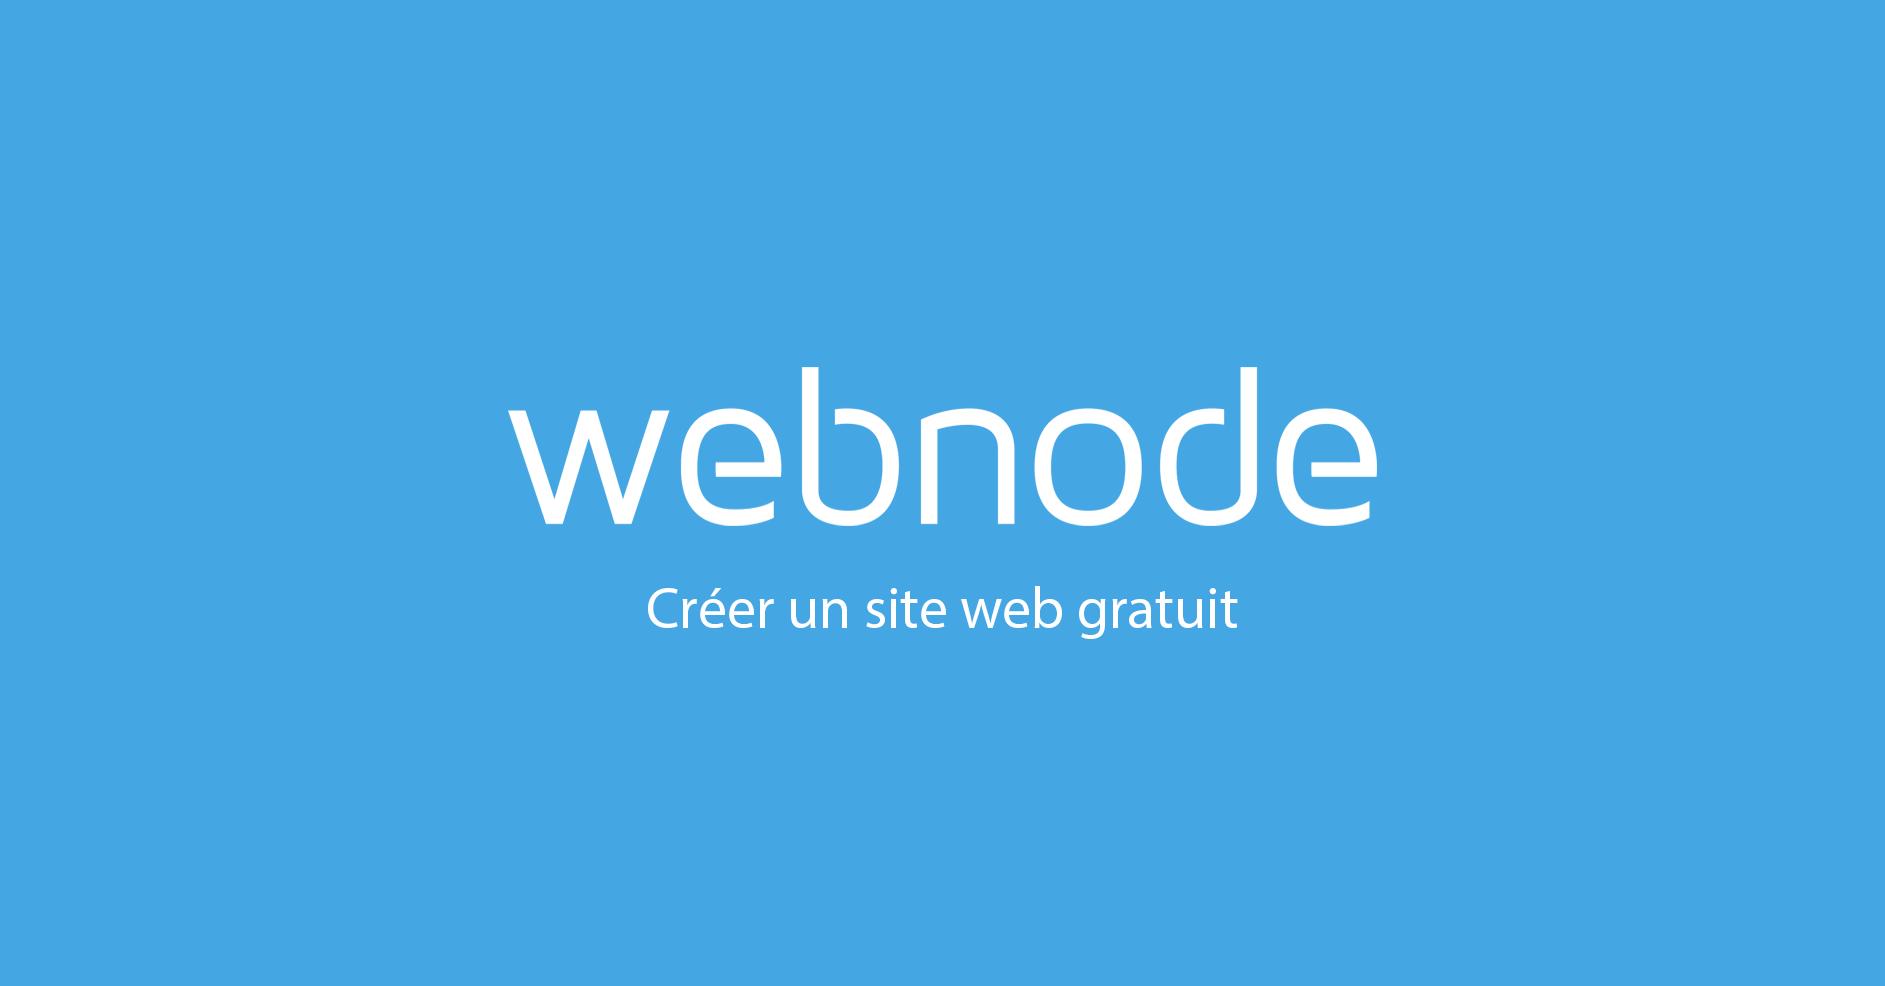 (c) Webnode.fr